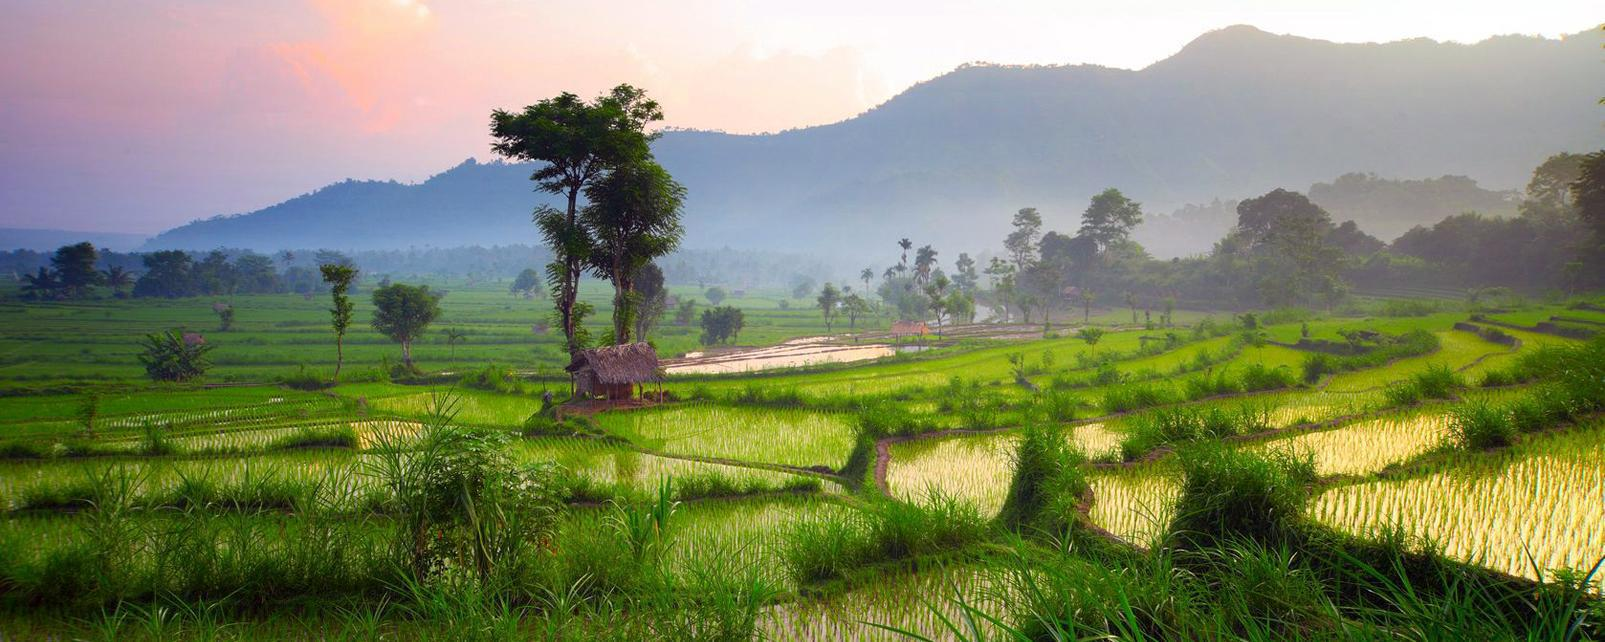 Asie, Indonésie, Bali, rizière, riz, terrasse, arbre,